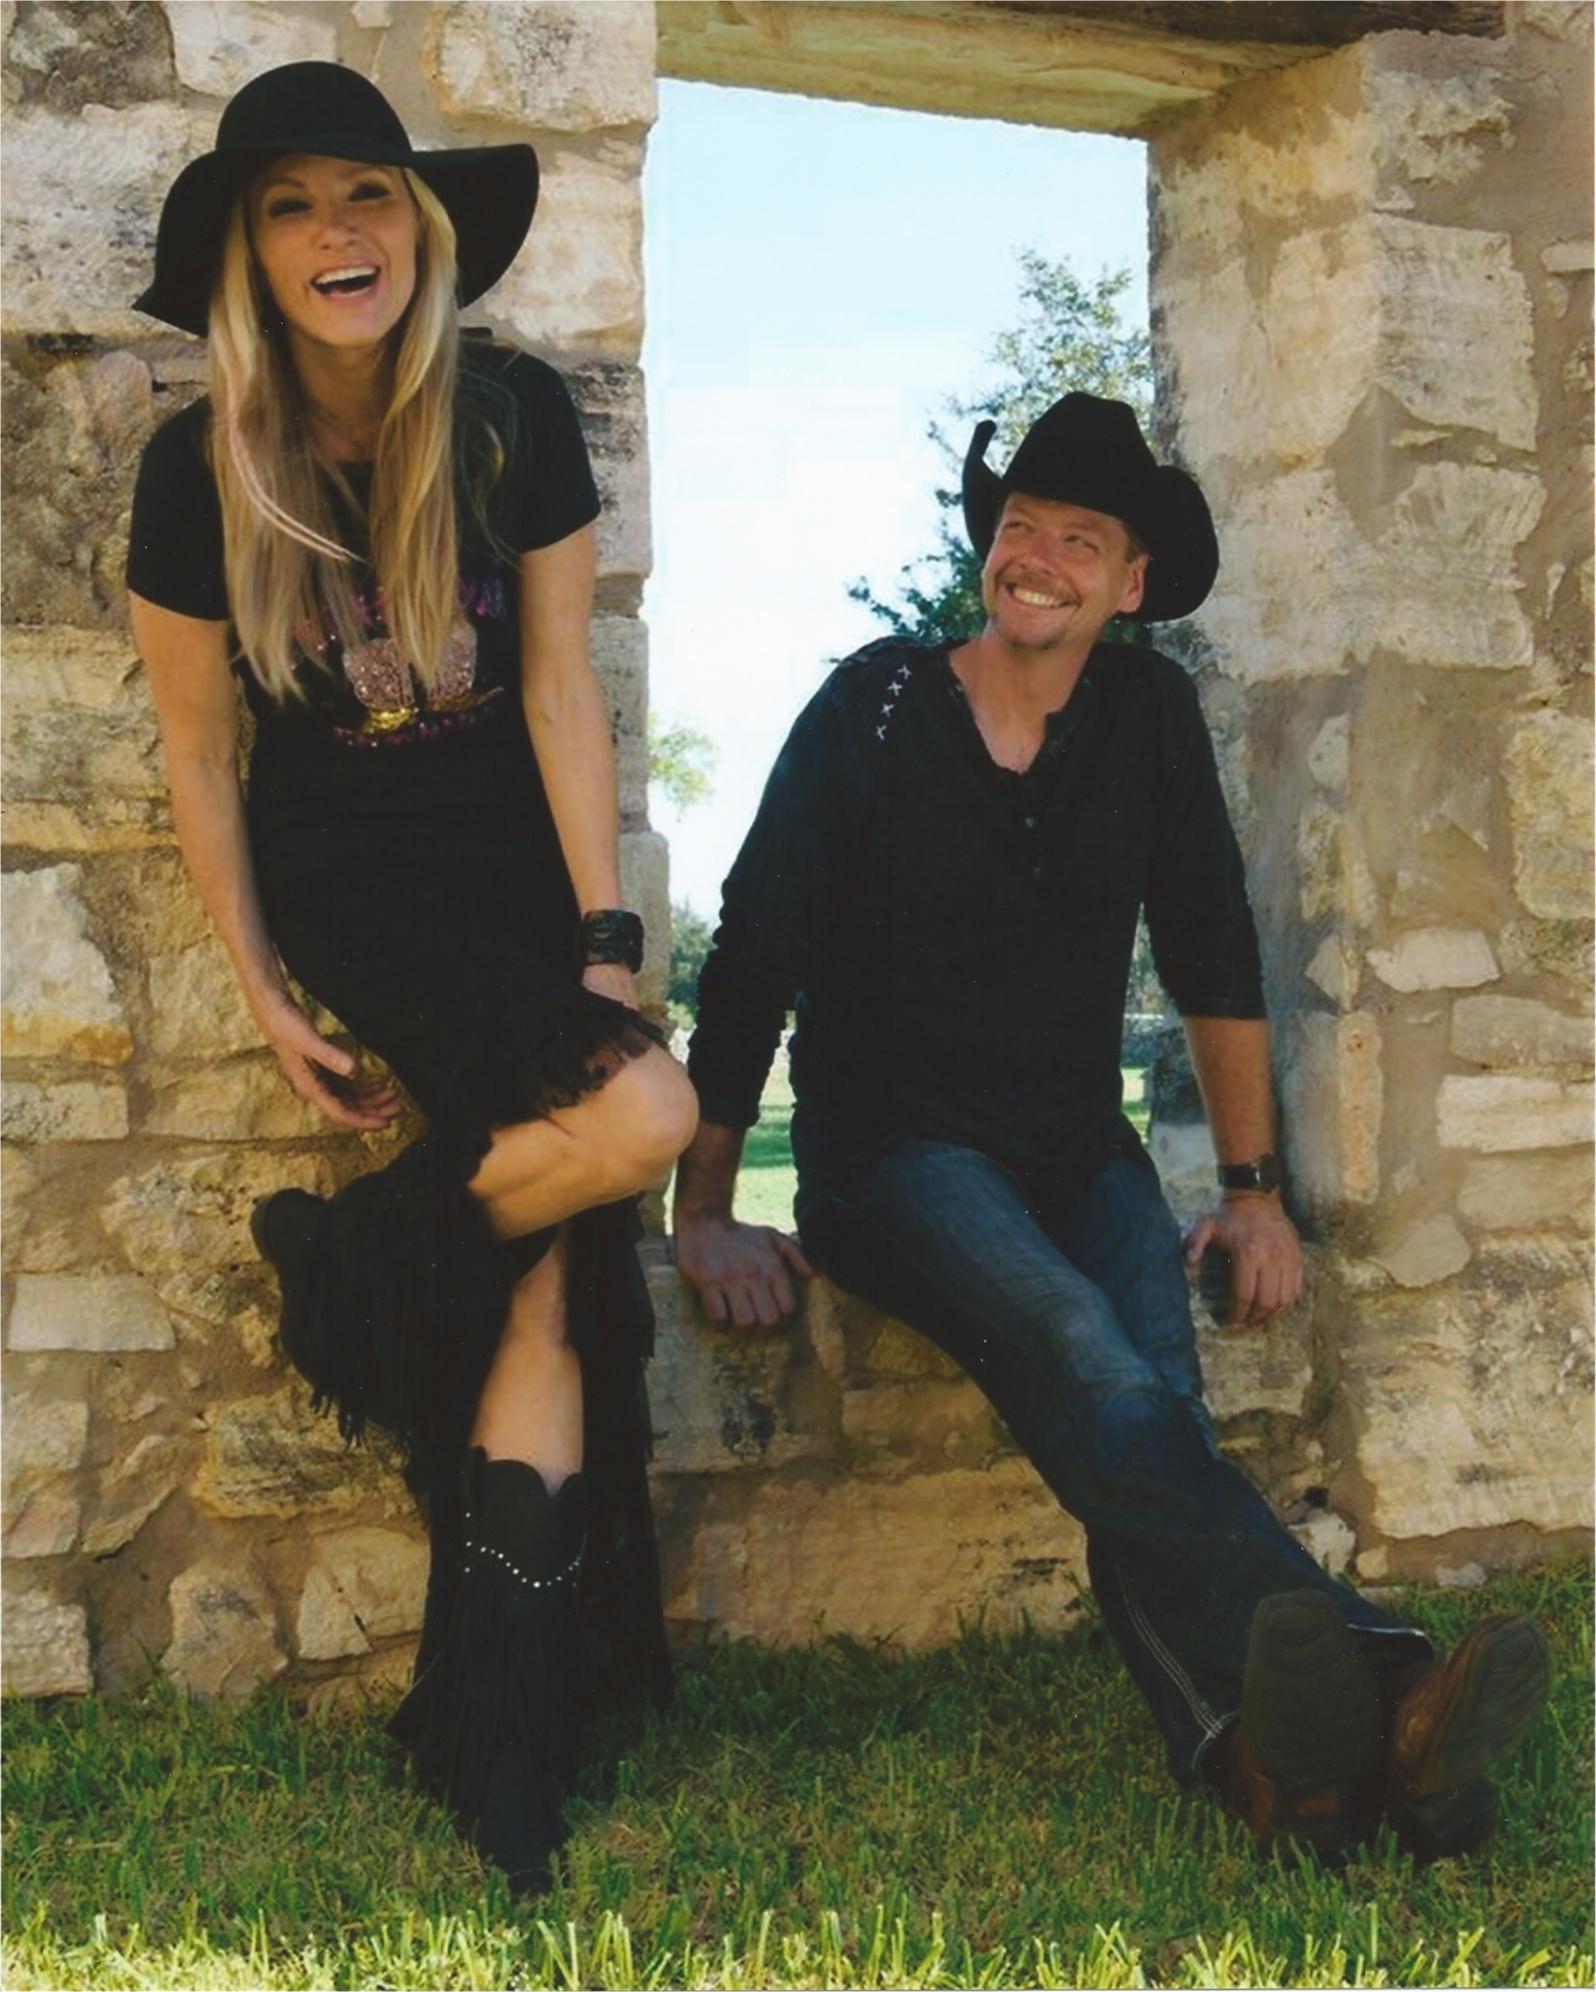 FREE CONCERT with Nashville Singer Songwriters & Trop Rock legends Thom Shepherd & Coley McCabe.